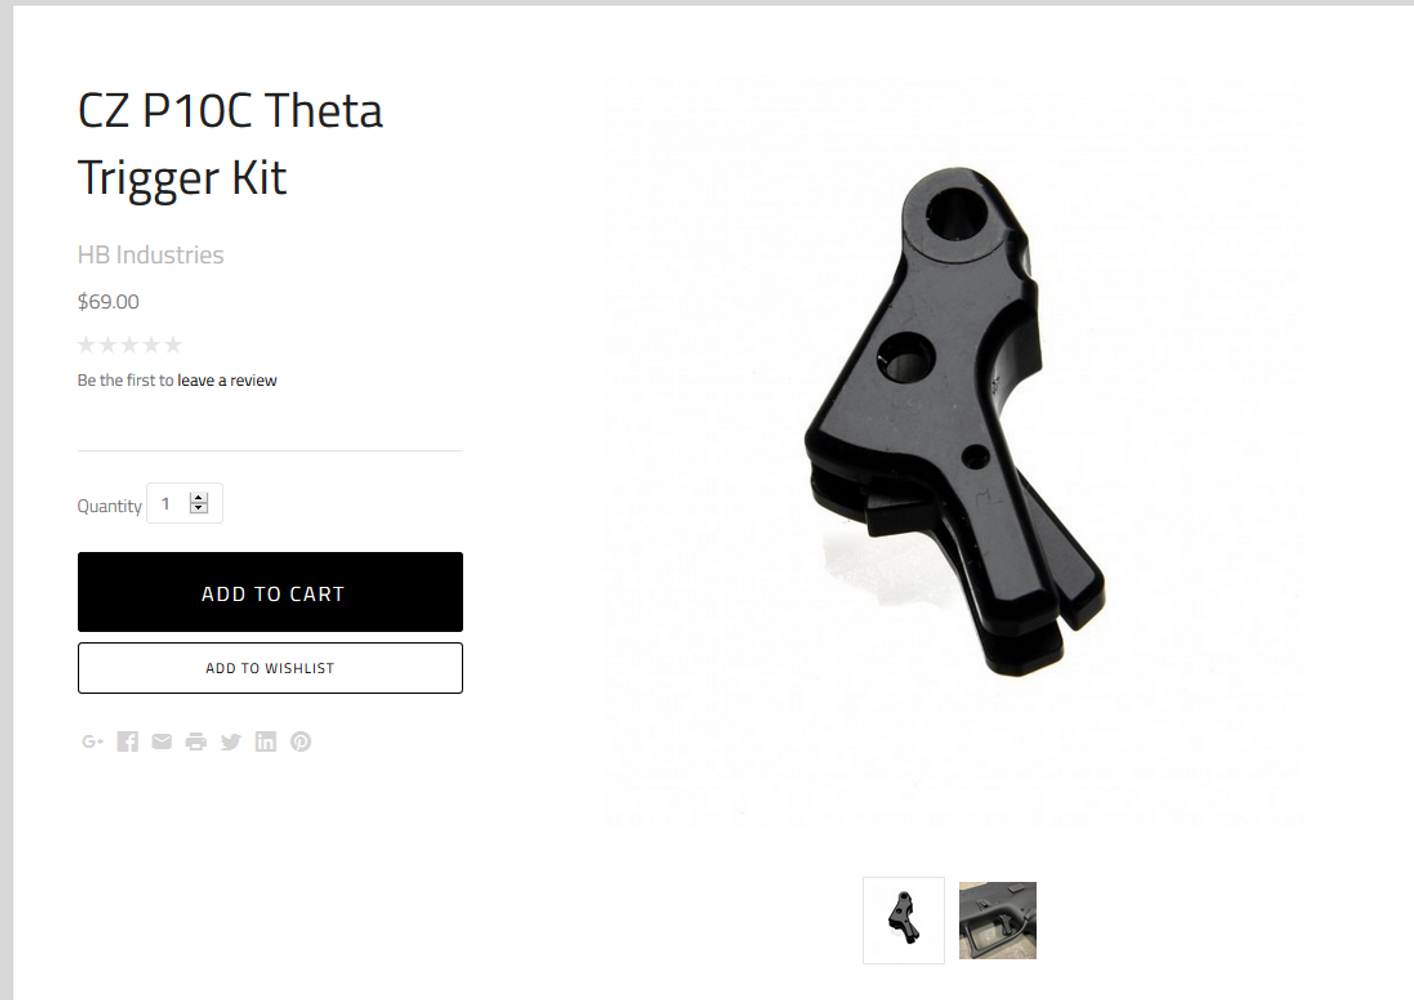 P10 Theta Triggers Finally in Stock!!!